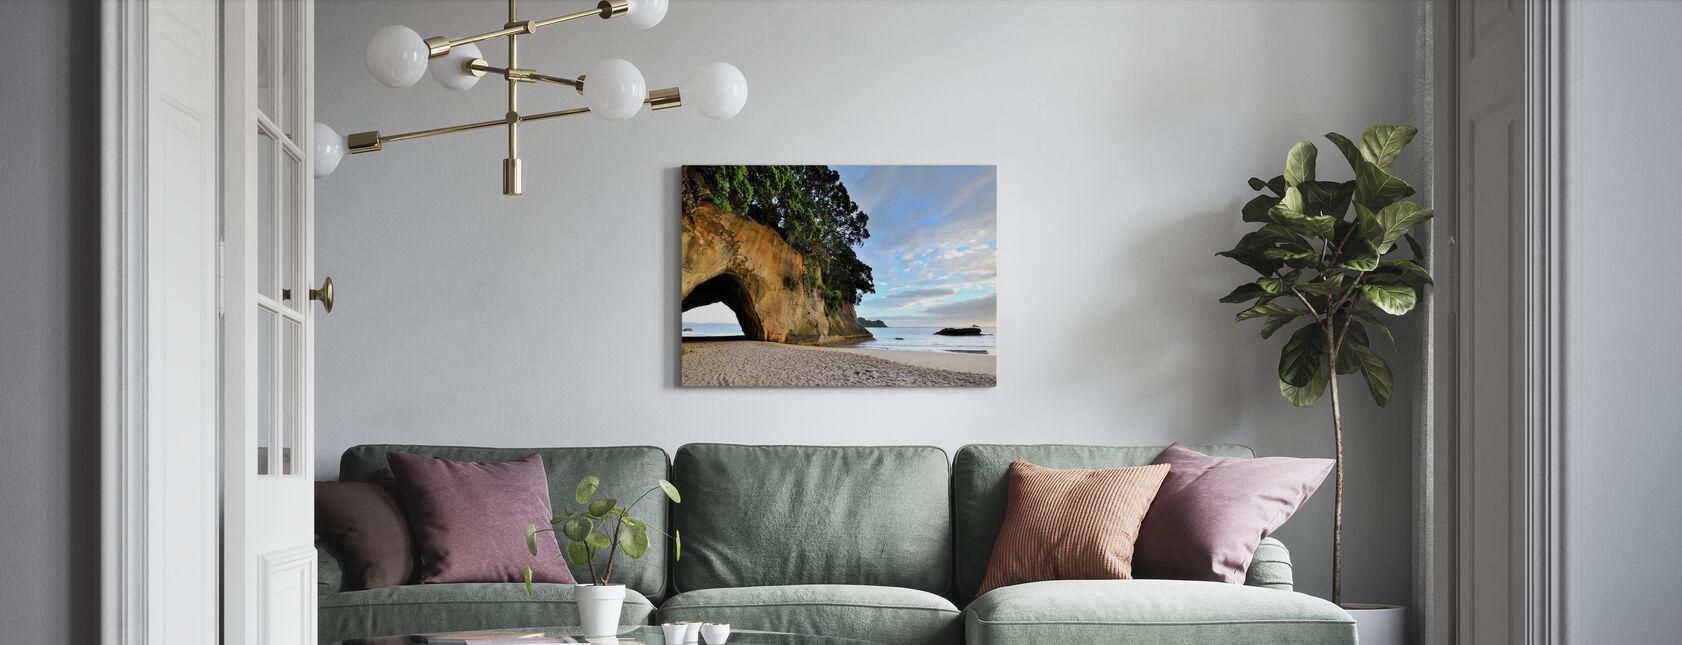 Felsenhöhle am Strand - Leinwandbild - Wohnzimmer